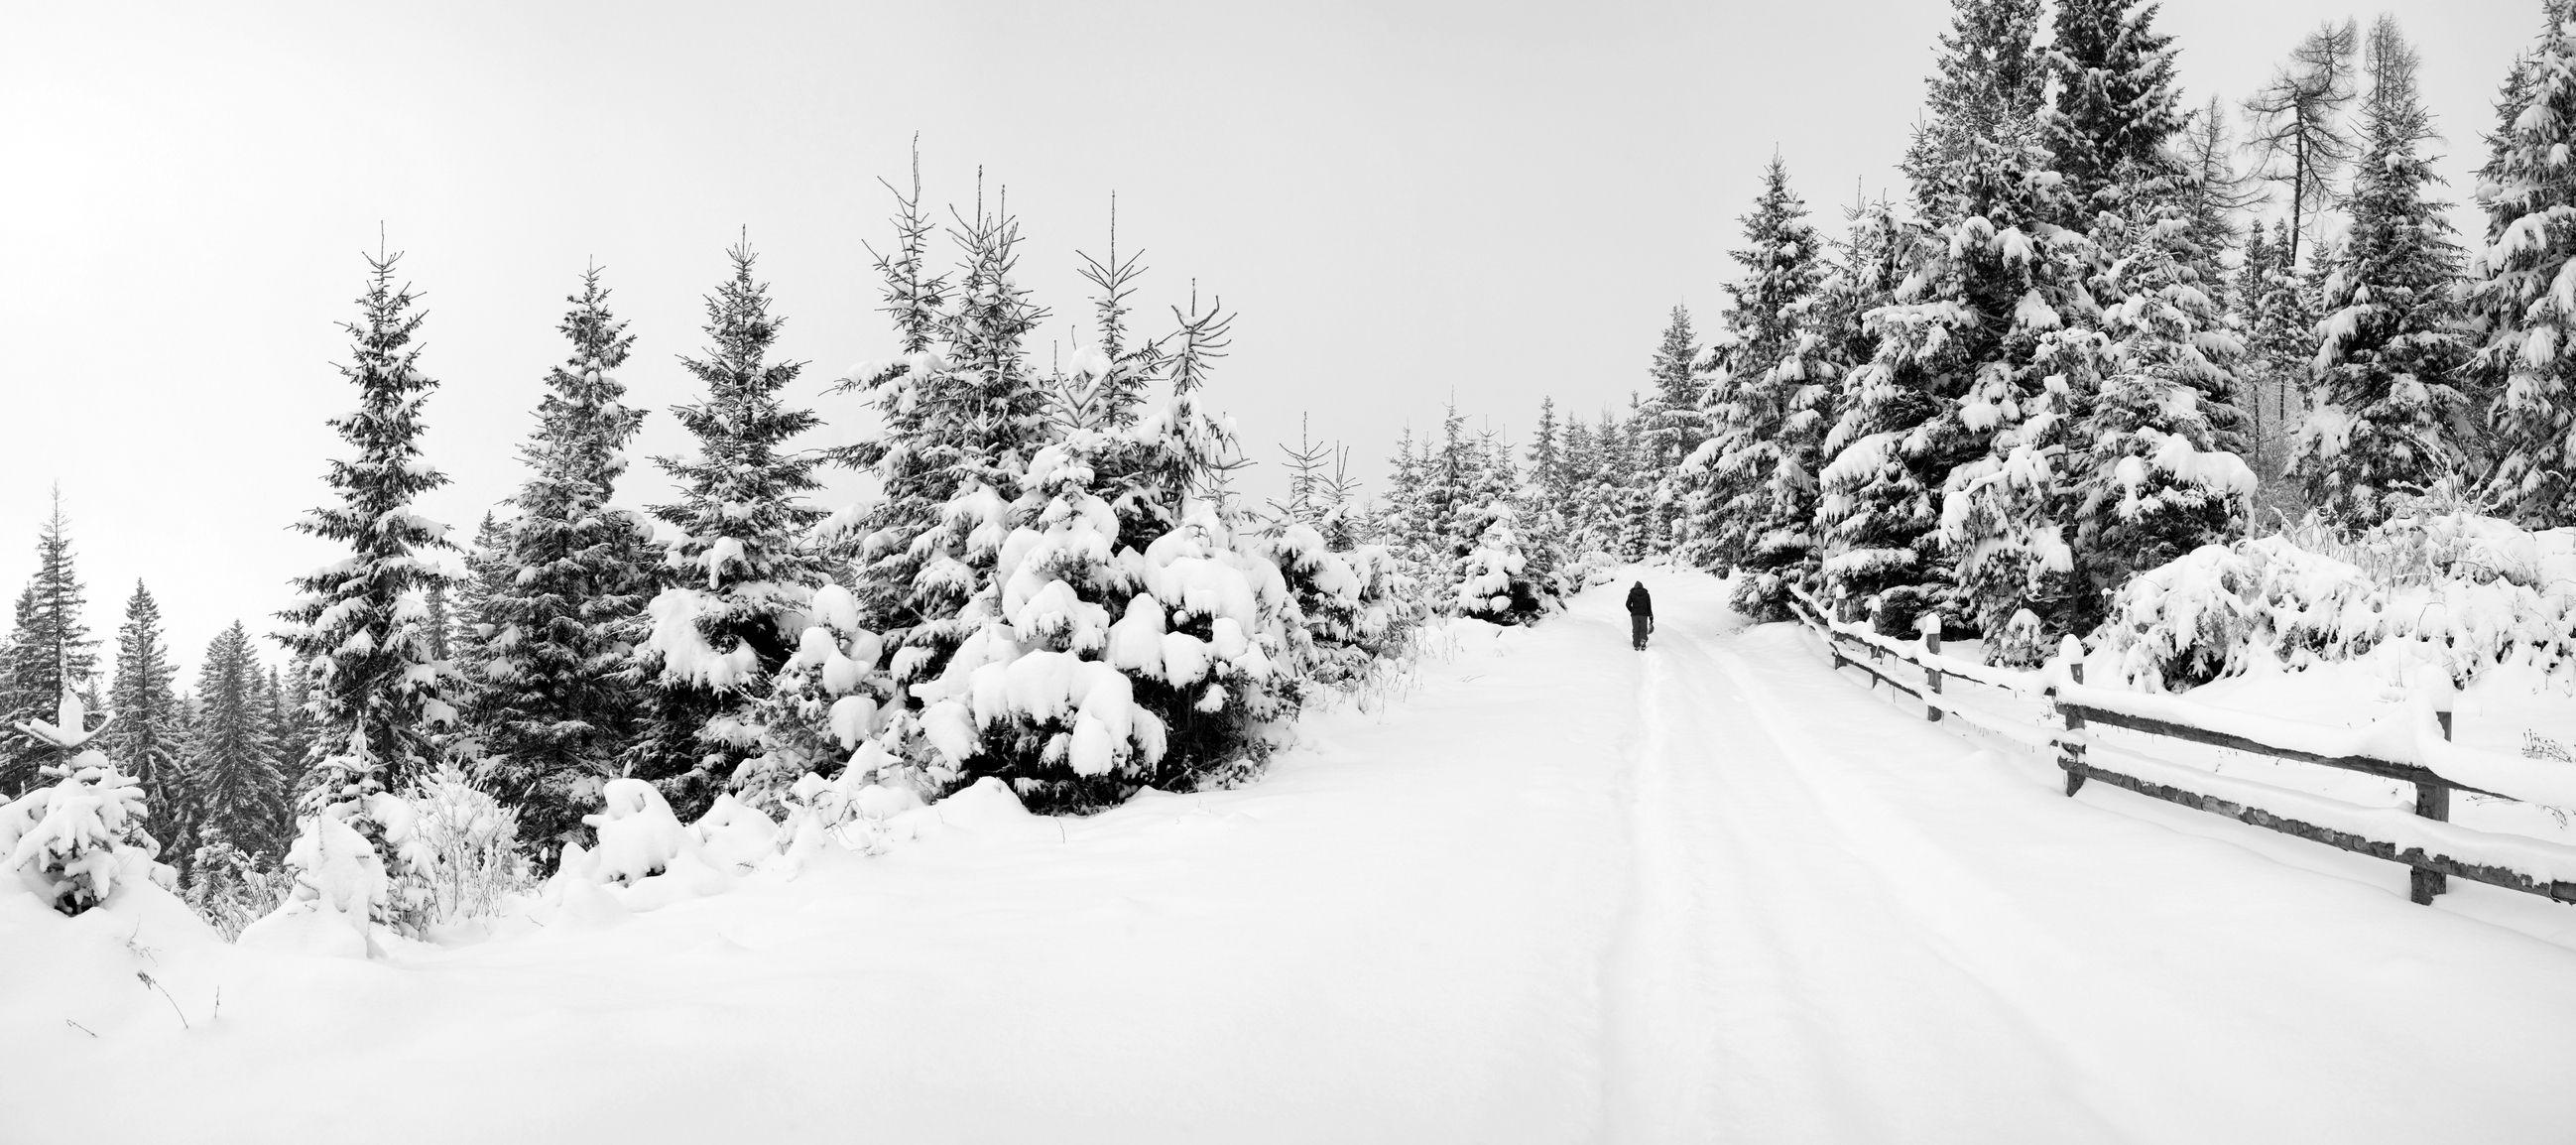 WINTER ROAD IN FOREST © Velkol | Dreamstime.com